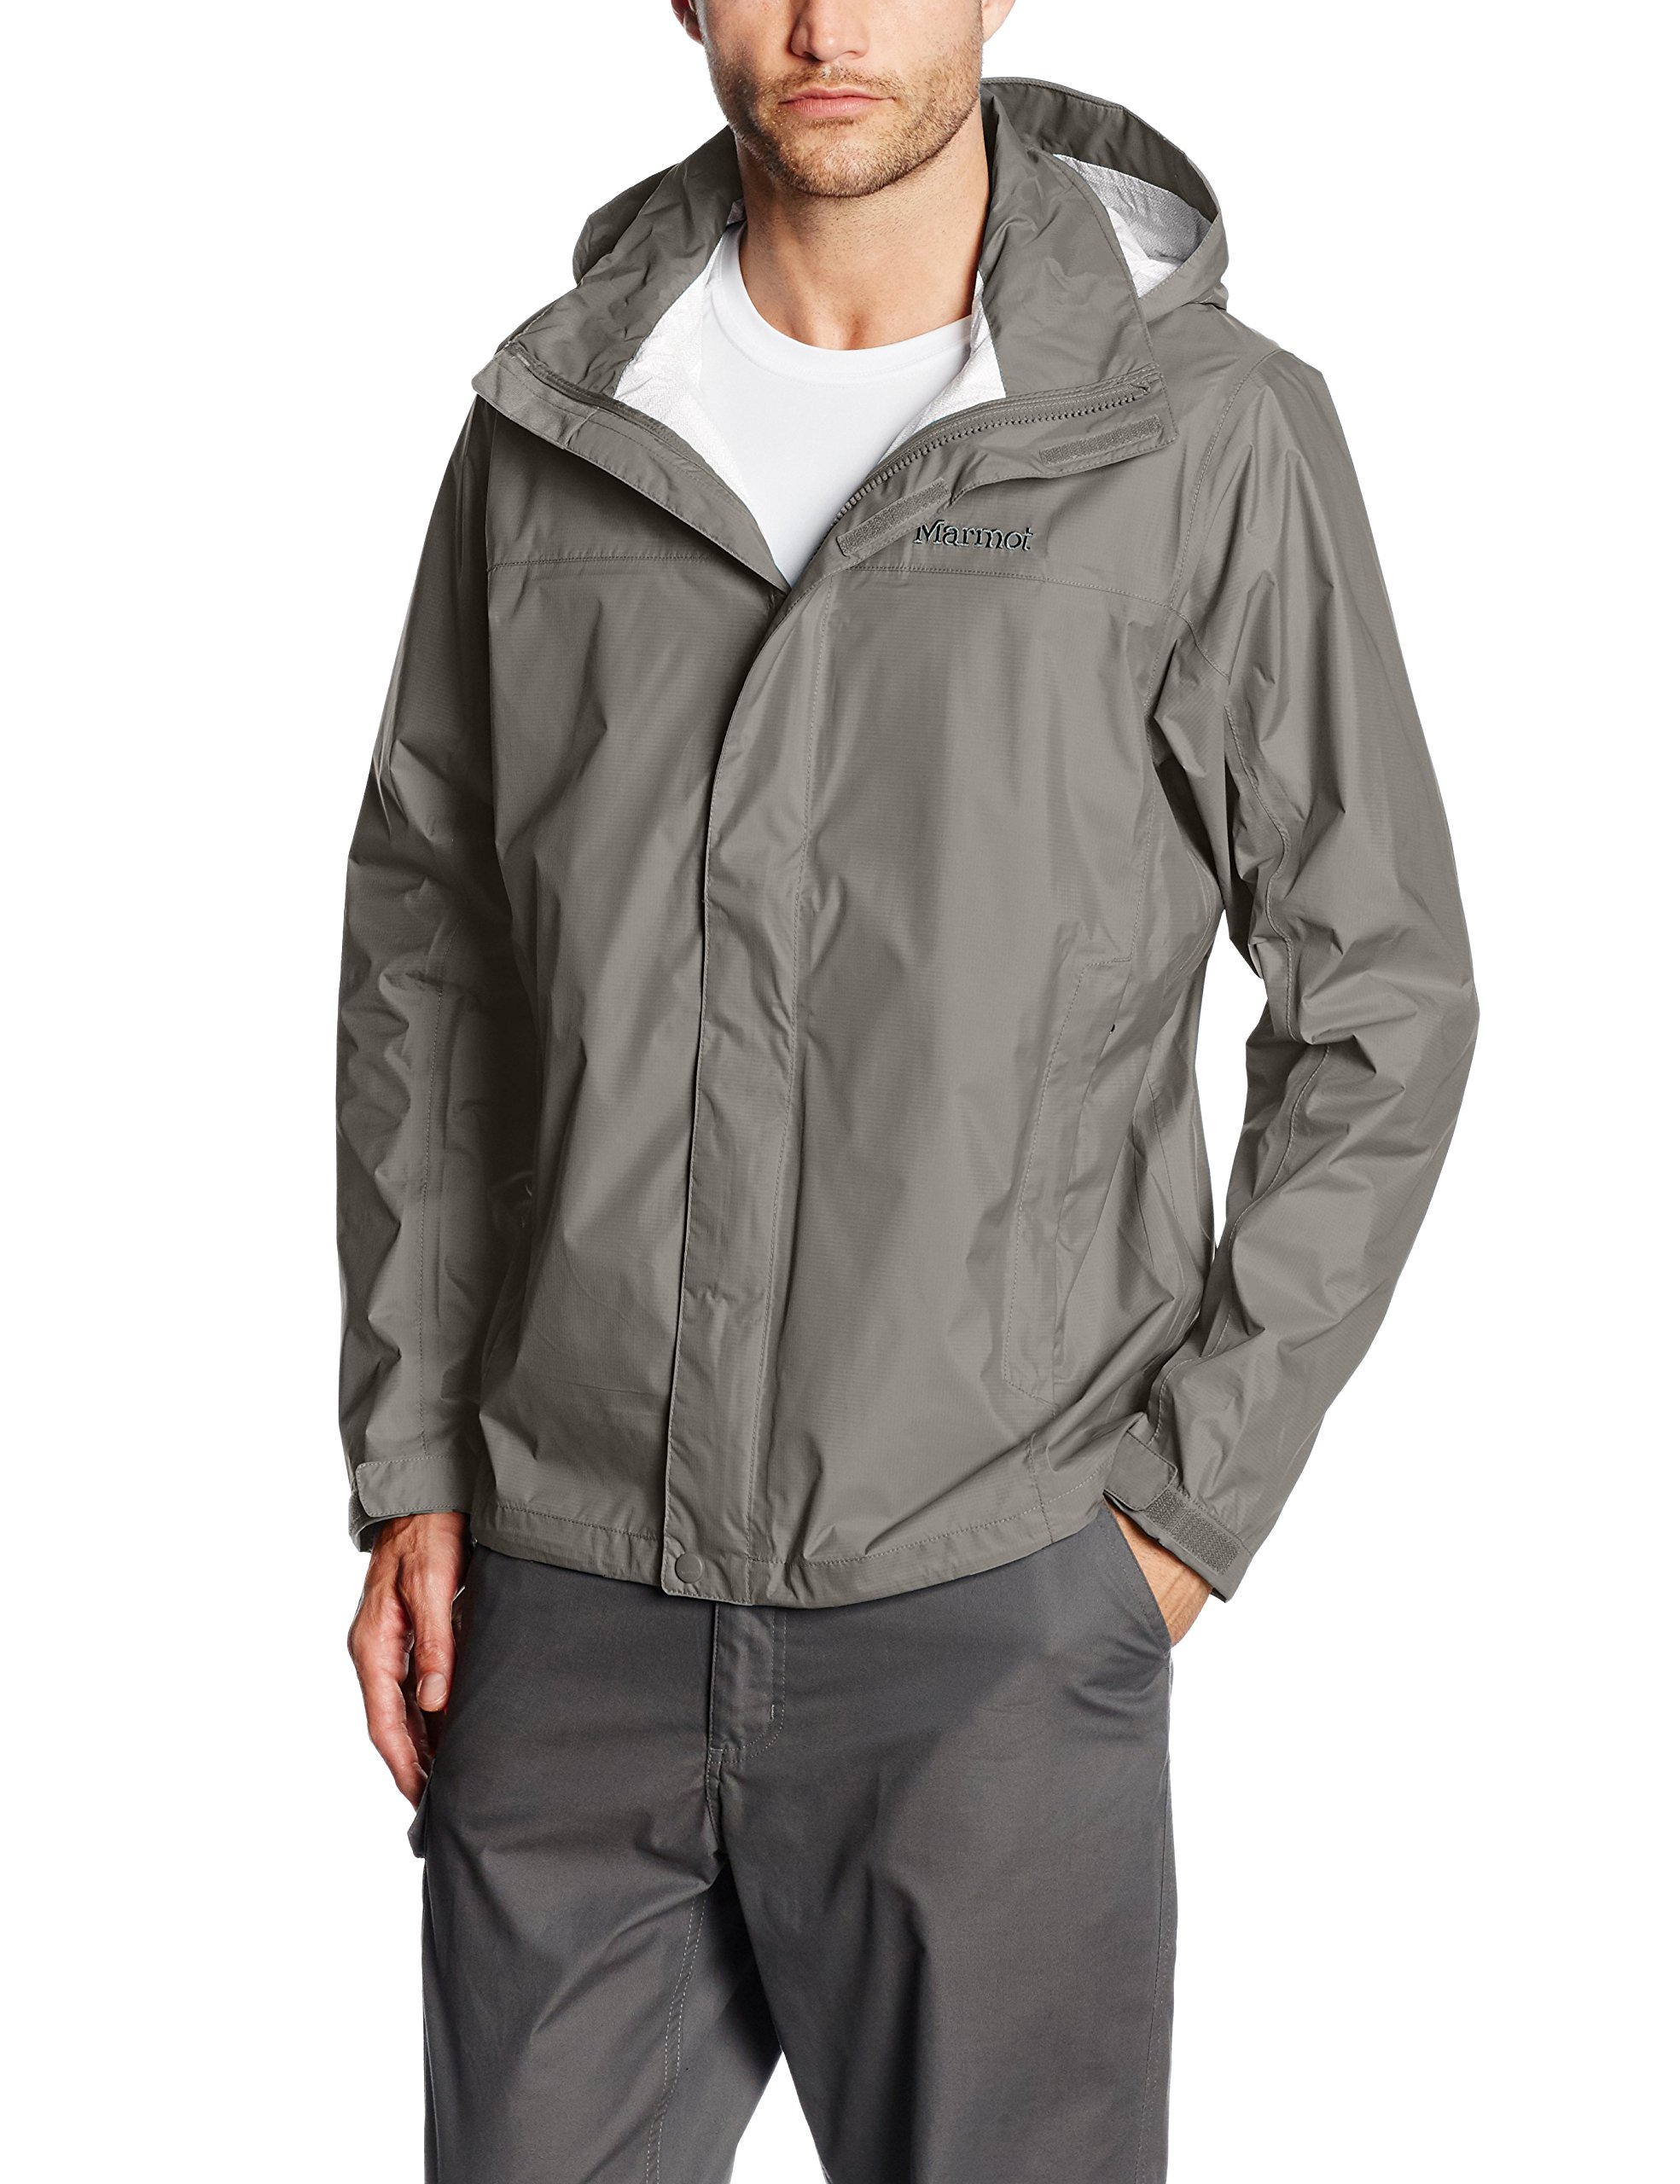 Marmot Men's PreCip Jacket Cinder XX-Large